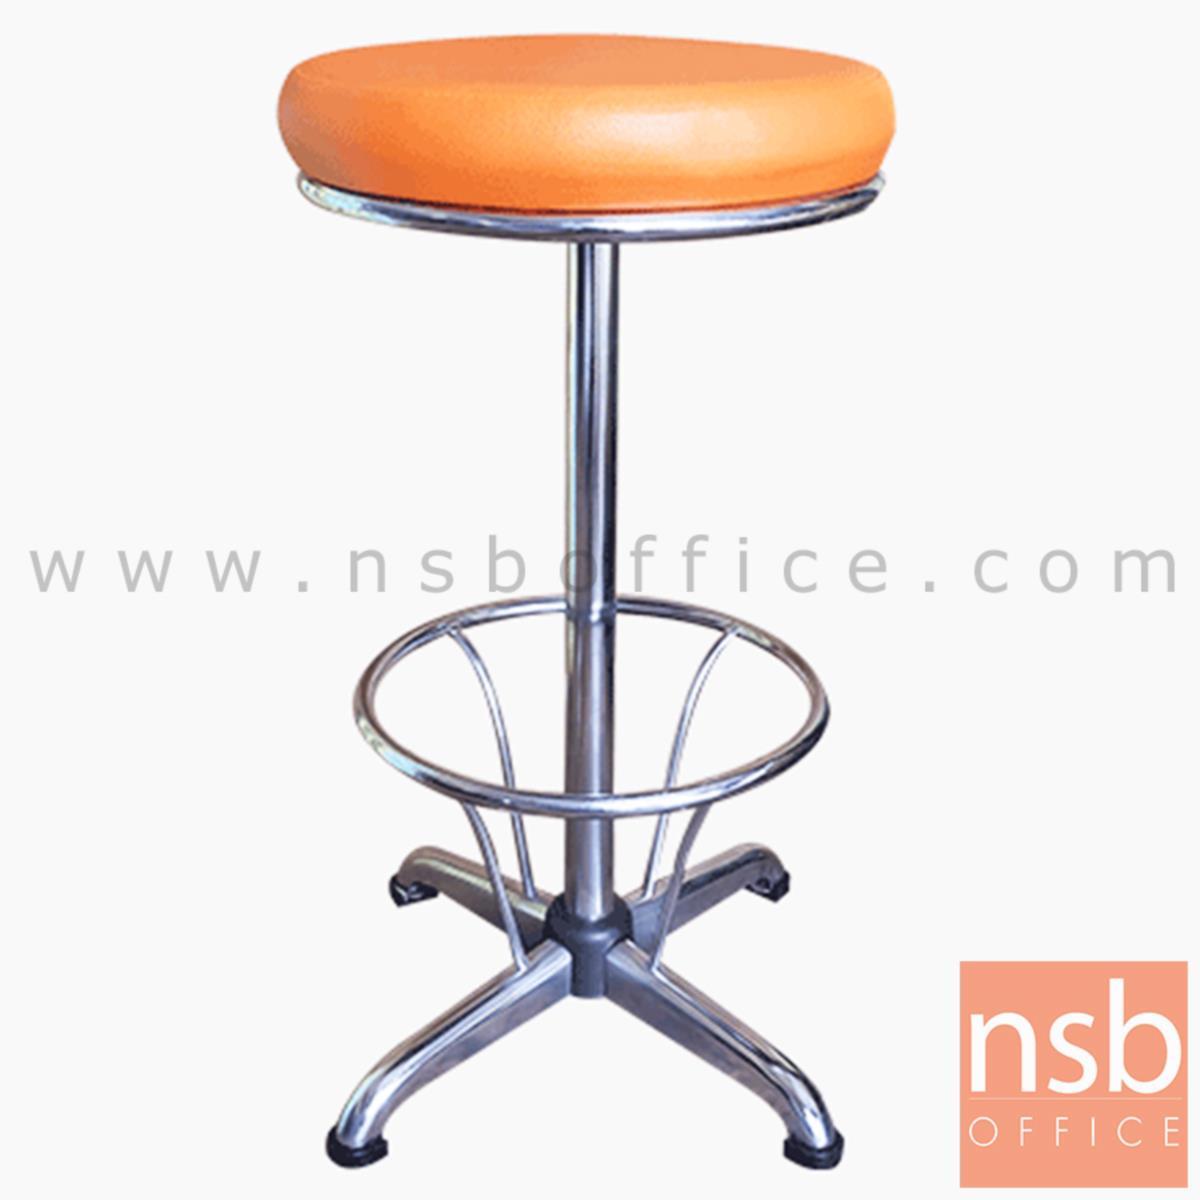 B09A202:เก้าอี้บาร์สตูลที่นั่งกลม  รุ่น Darcy (ดาร์ซี่)  ขาเหล็กชุบโครเมี่ยม